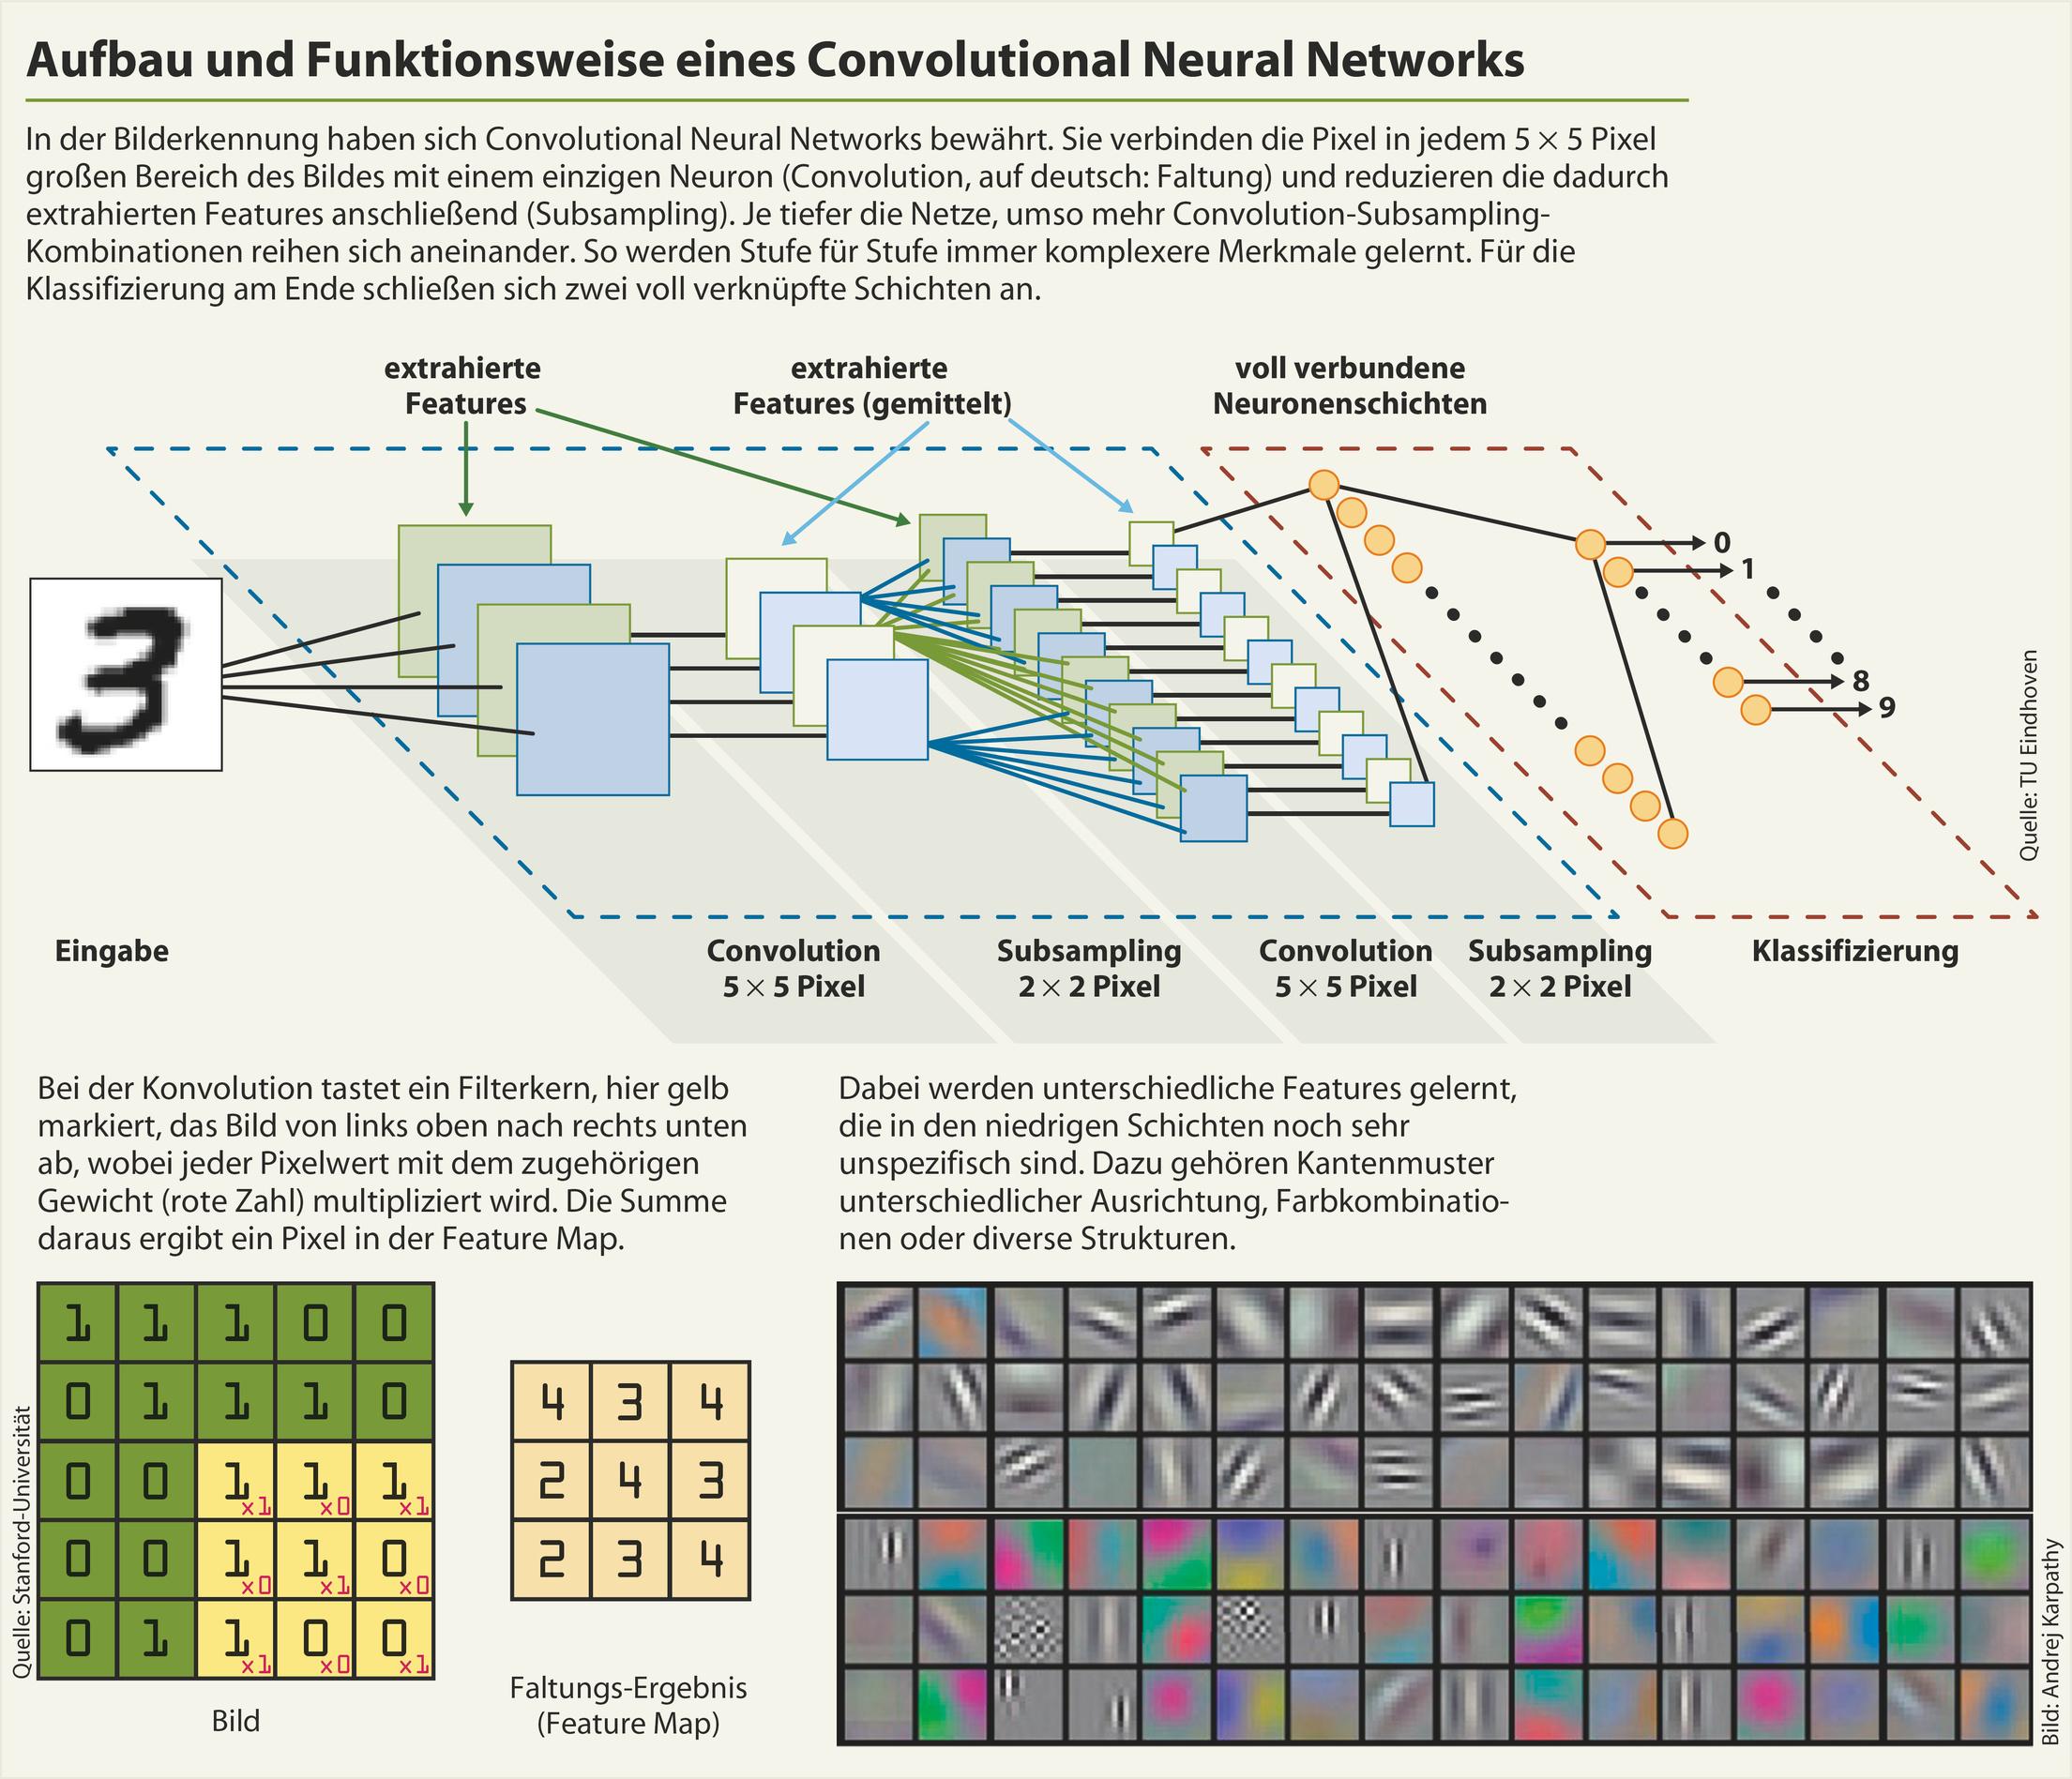 Die Mathematik neuronaler Netze: einfache Mechanismen, komplexe ...